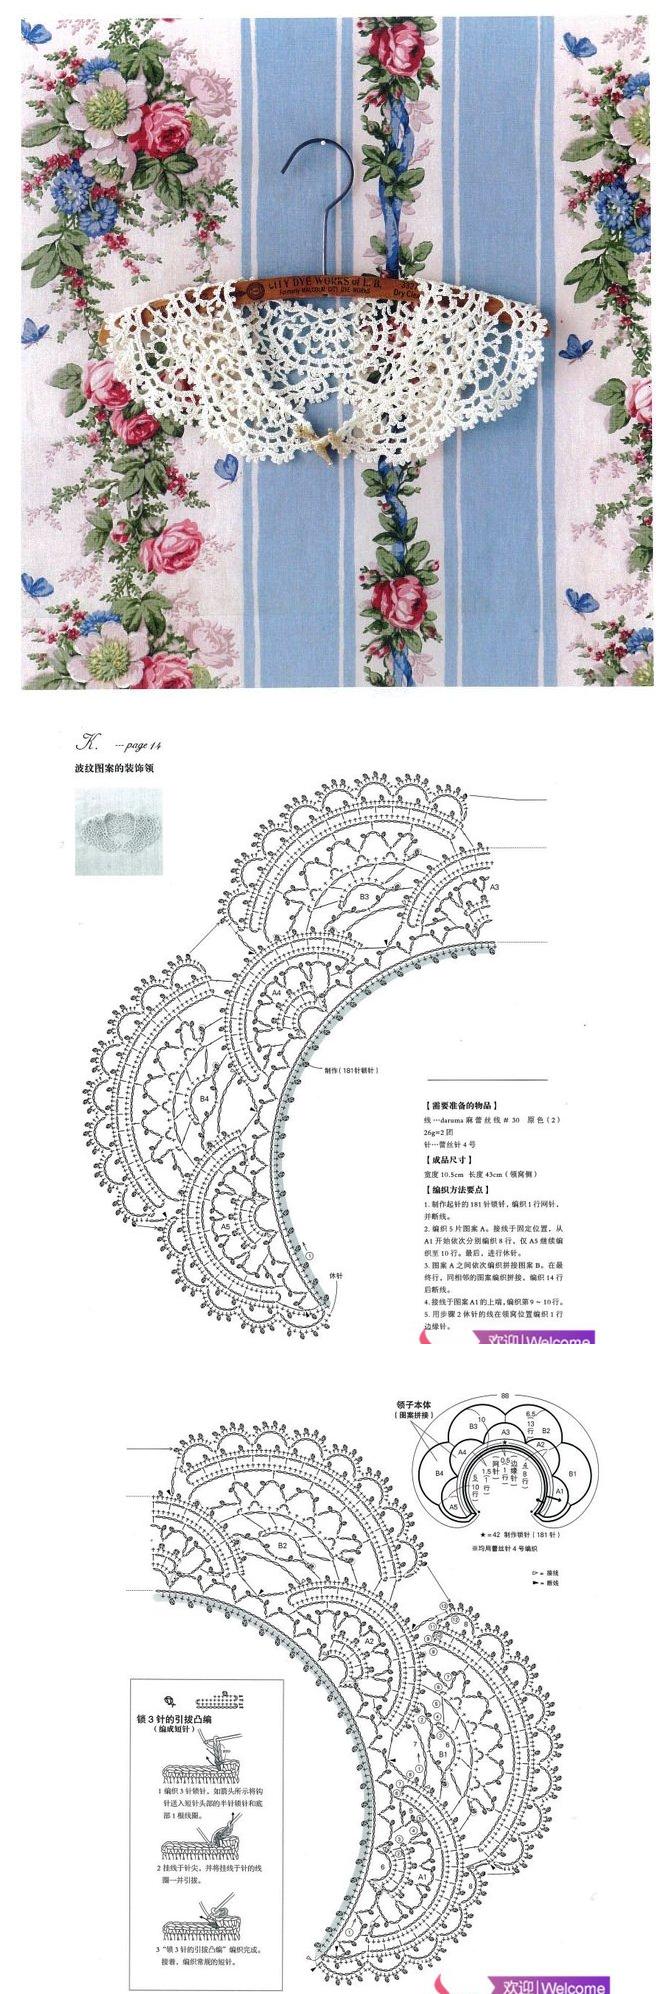 Japanese pattern-reading tutorial: Lesson 4a crochet | Crochet tres ...